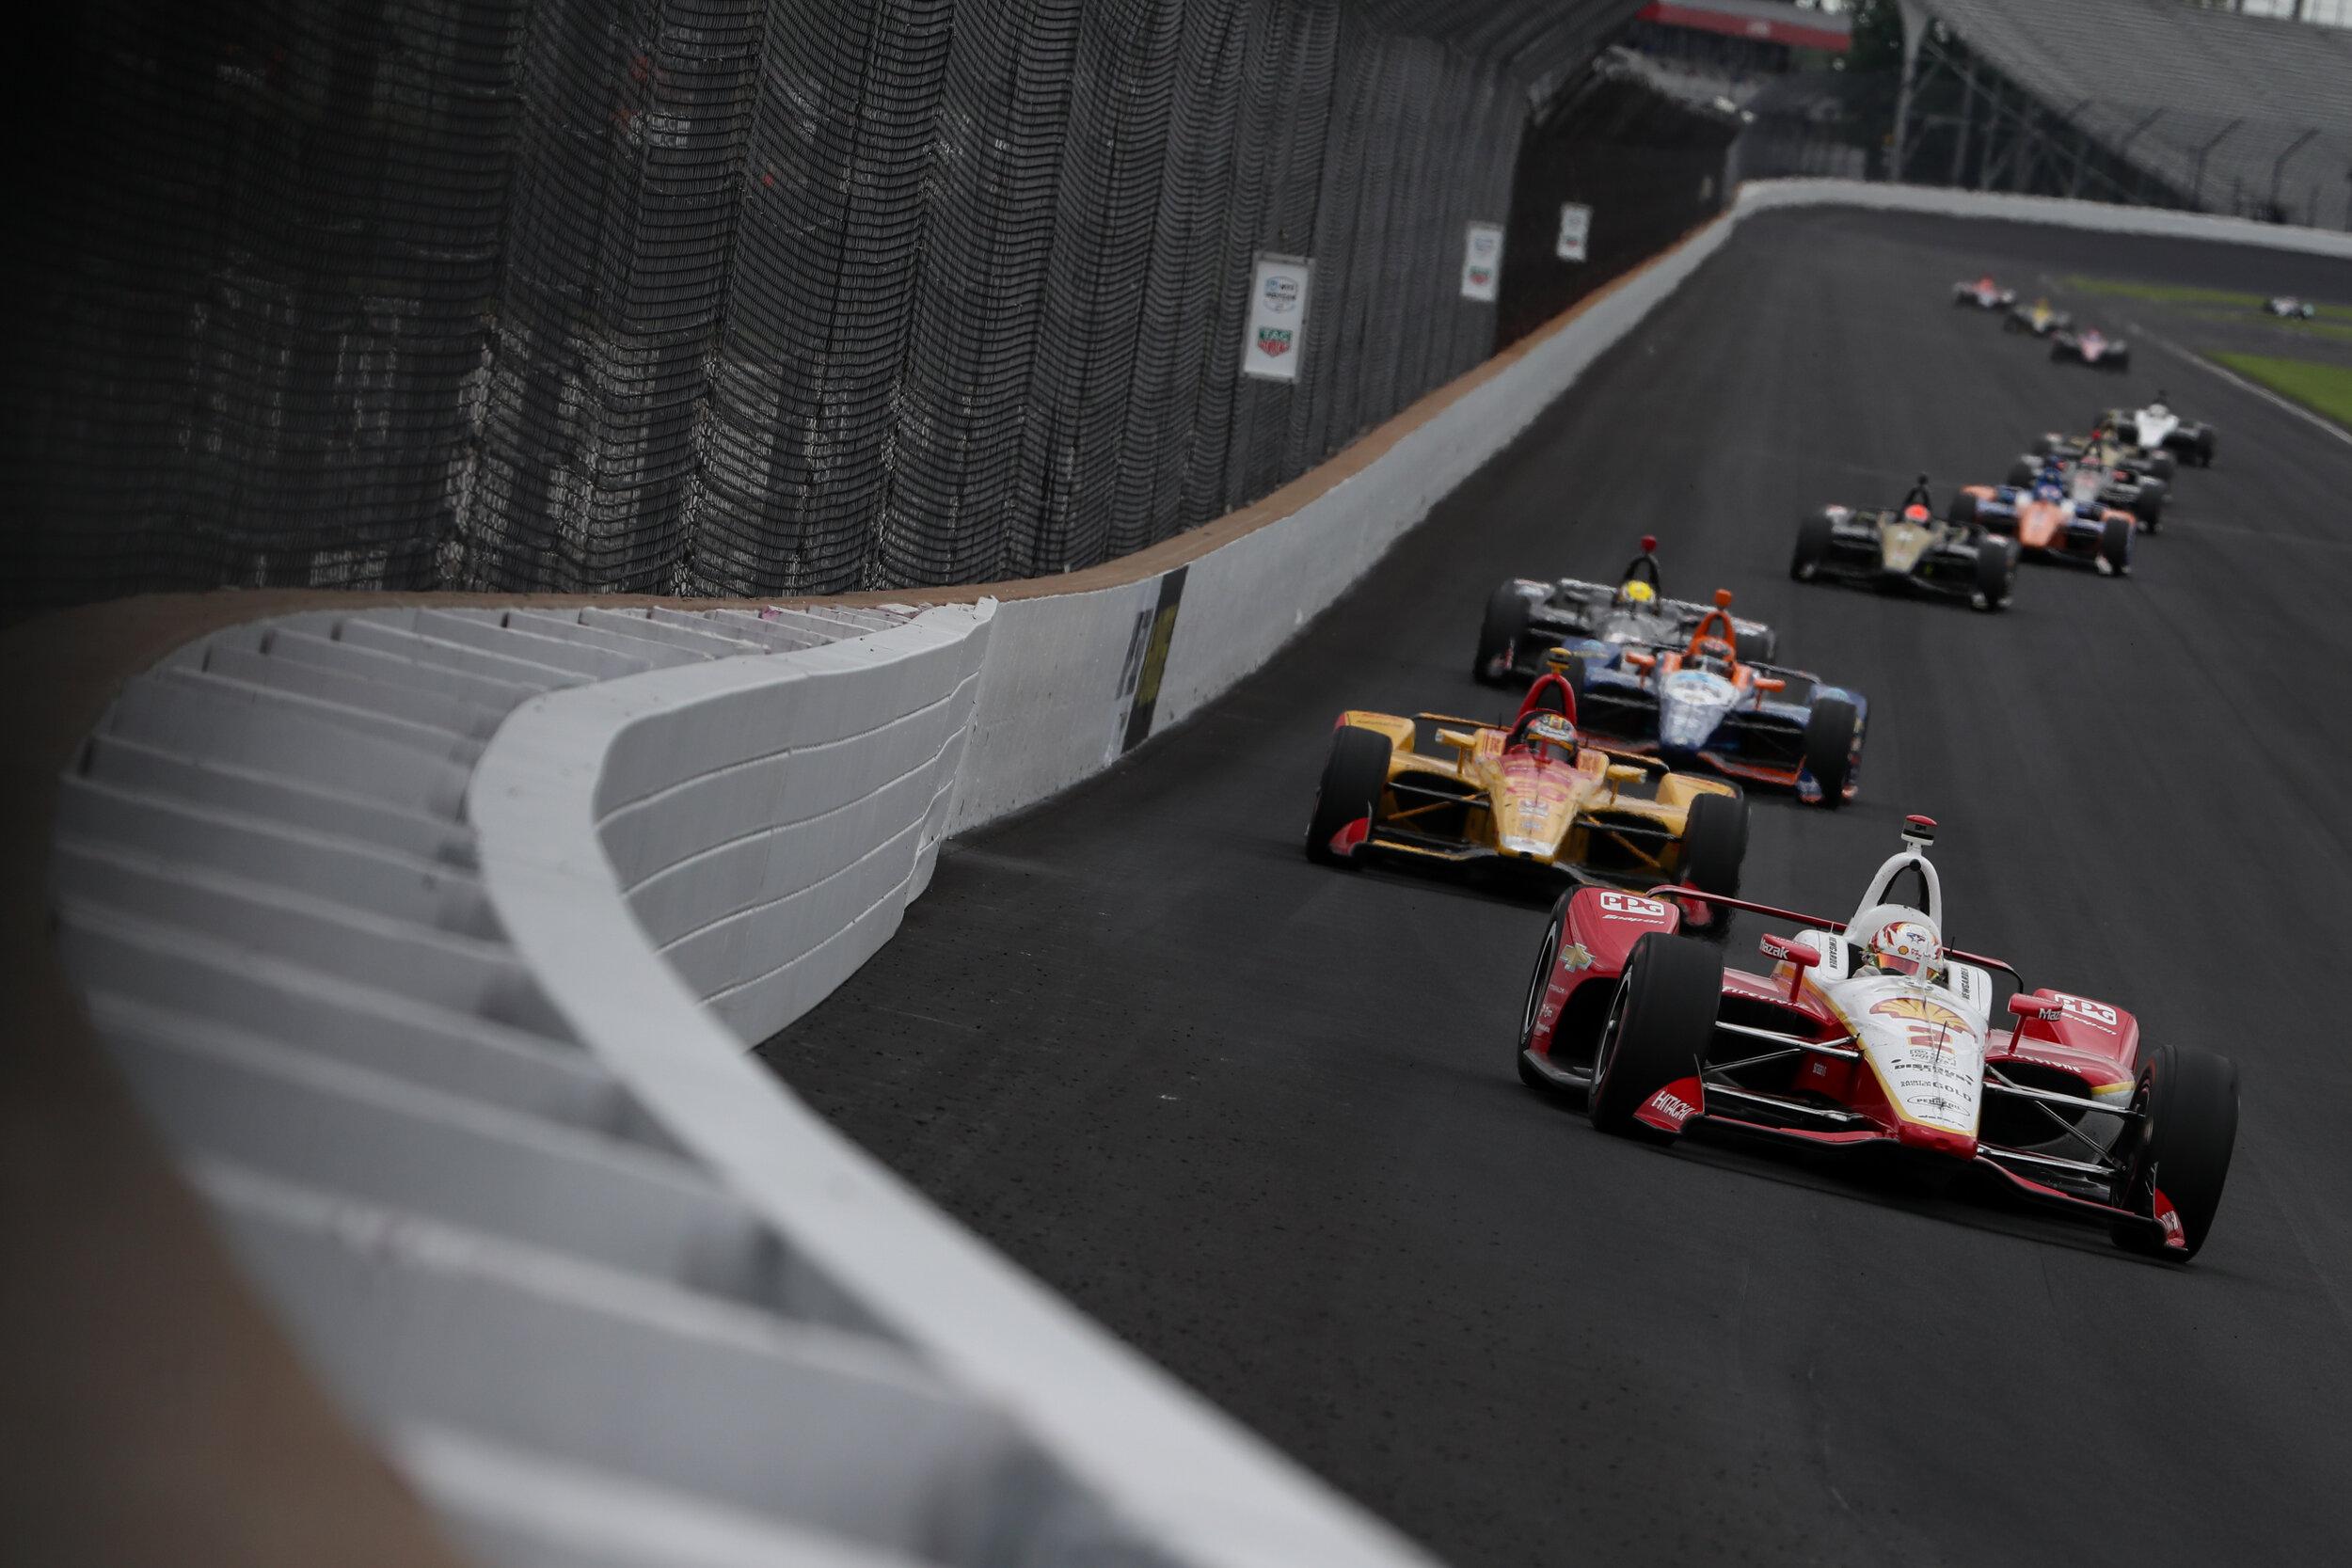 Indianapolis Motor Speedway 2002 United States Grand Prix Program